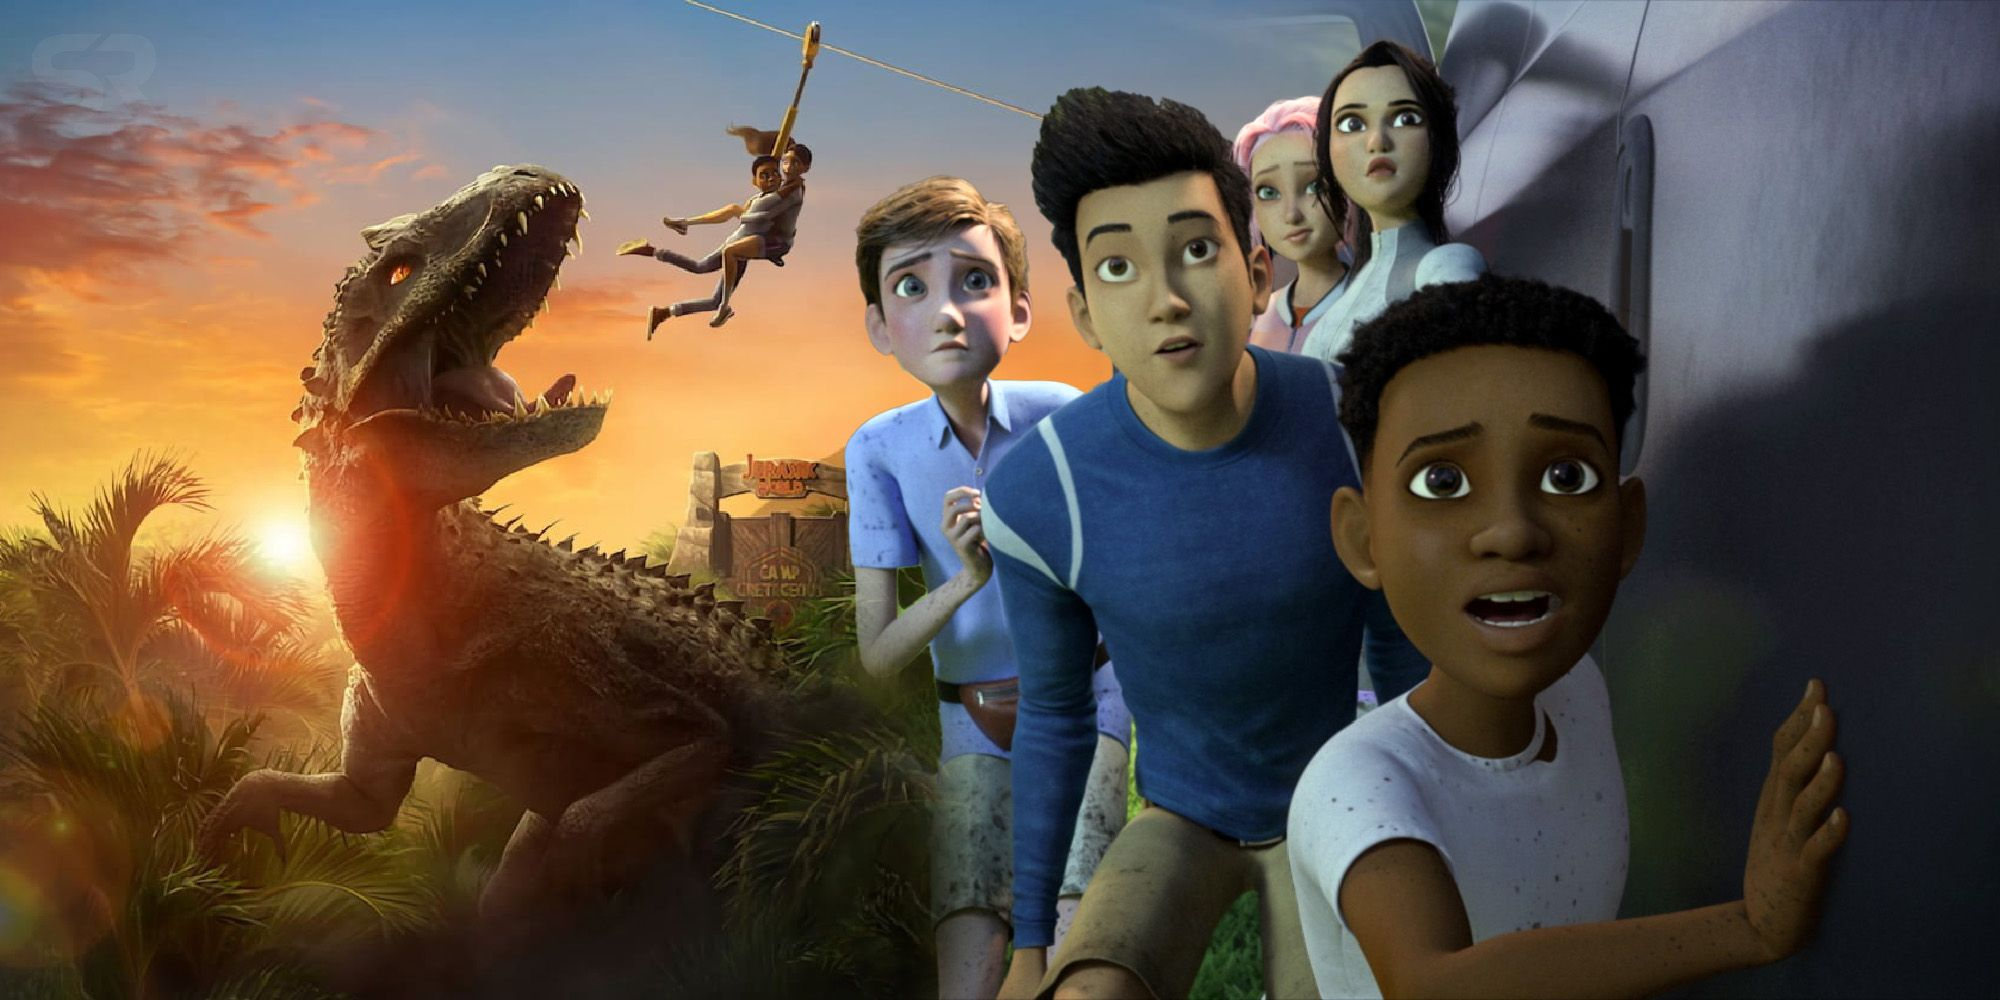 Jurassic World: Camp Cretaceous Season 4 Sets December Release Date